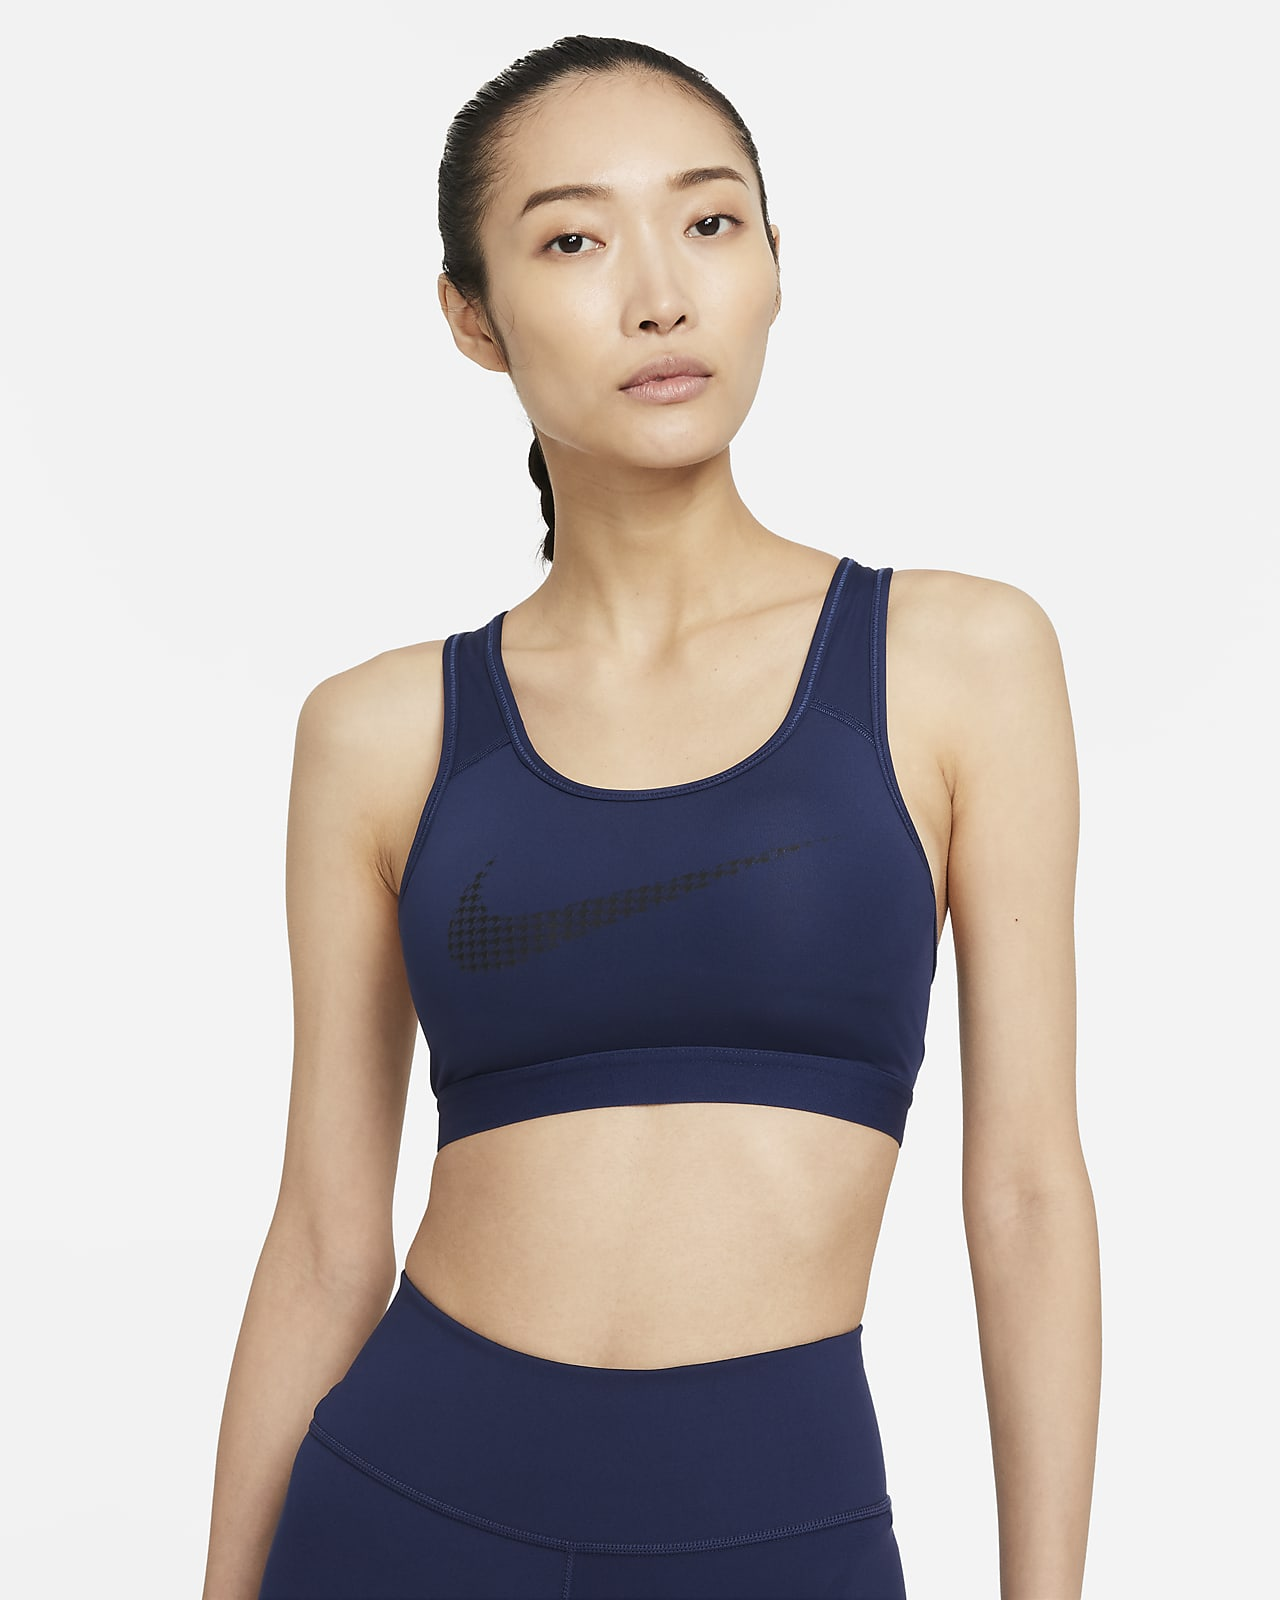 Nike Dri-FIT Swoosh Icon Clash Women's Medium-Support Padded Graphic Sports Bra